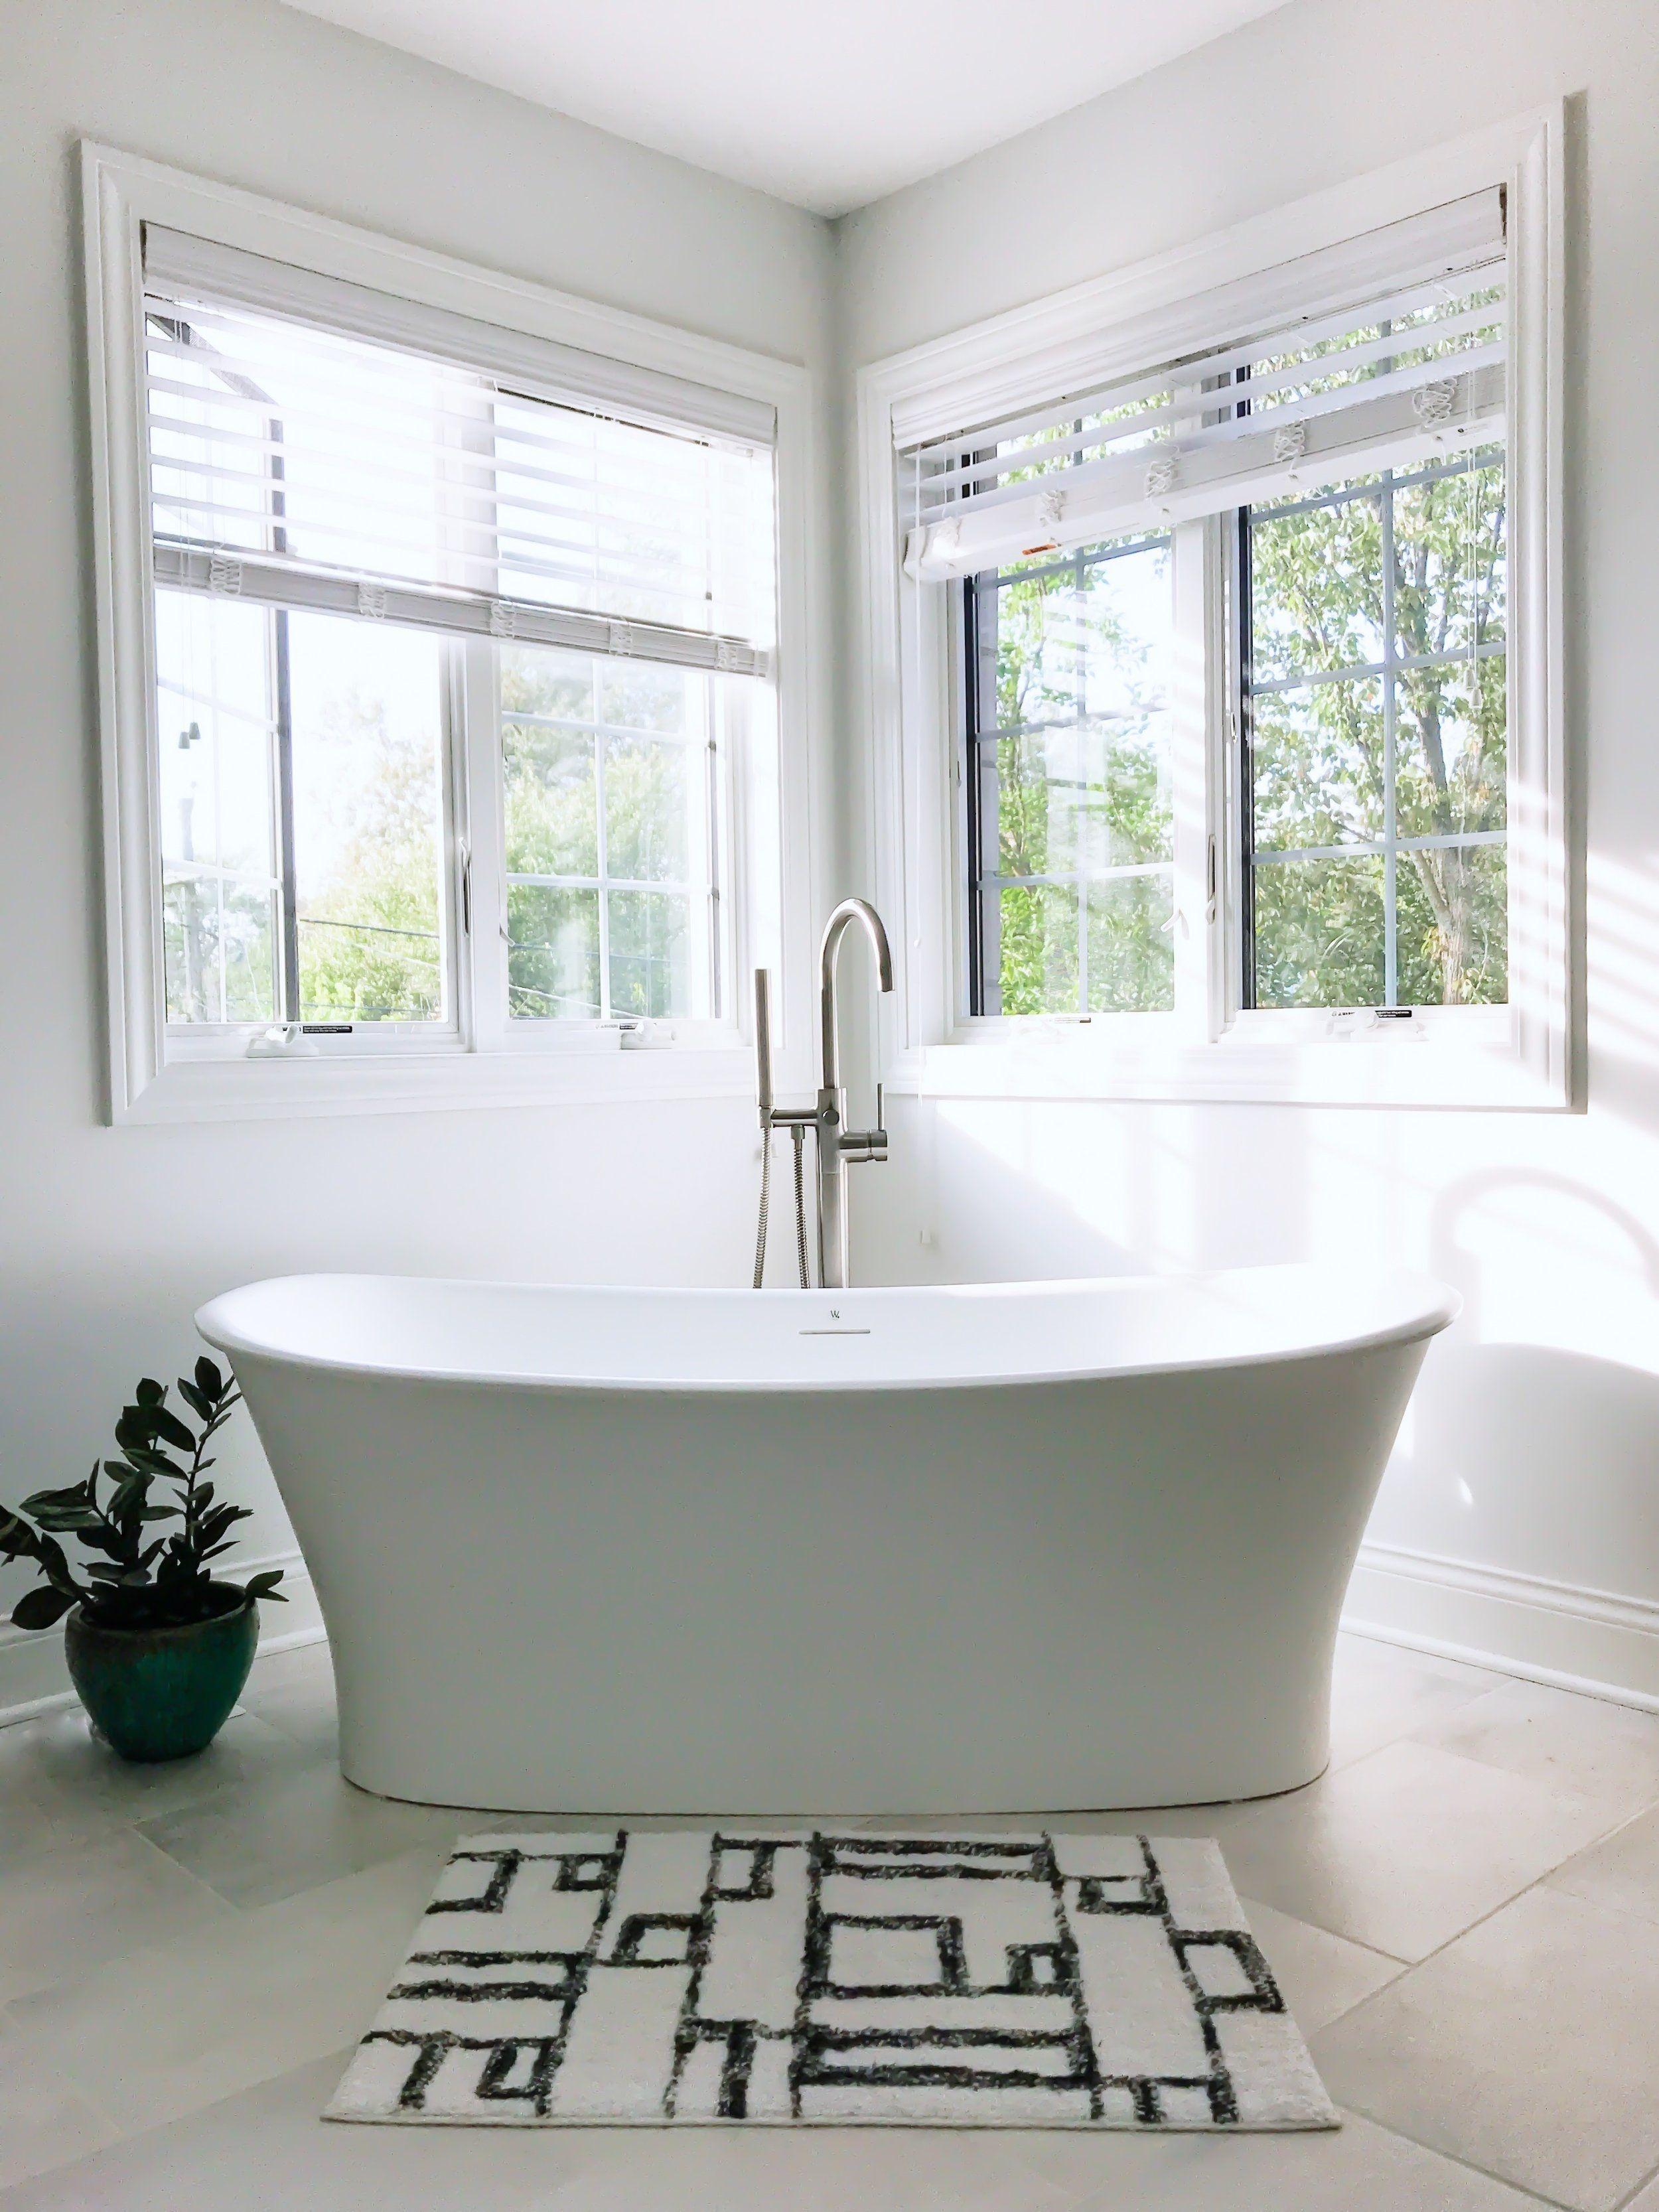 Modern Master Bathroom Ideas In 2020 Modern Master Bathroom Master Bedroom Bathroom Bathtub Design